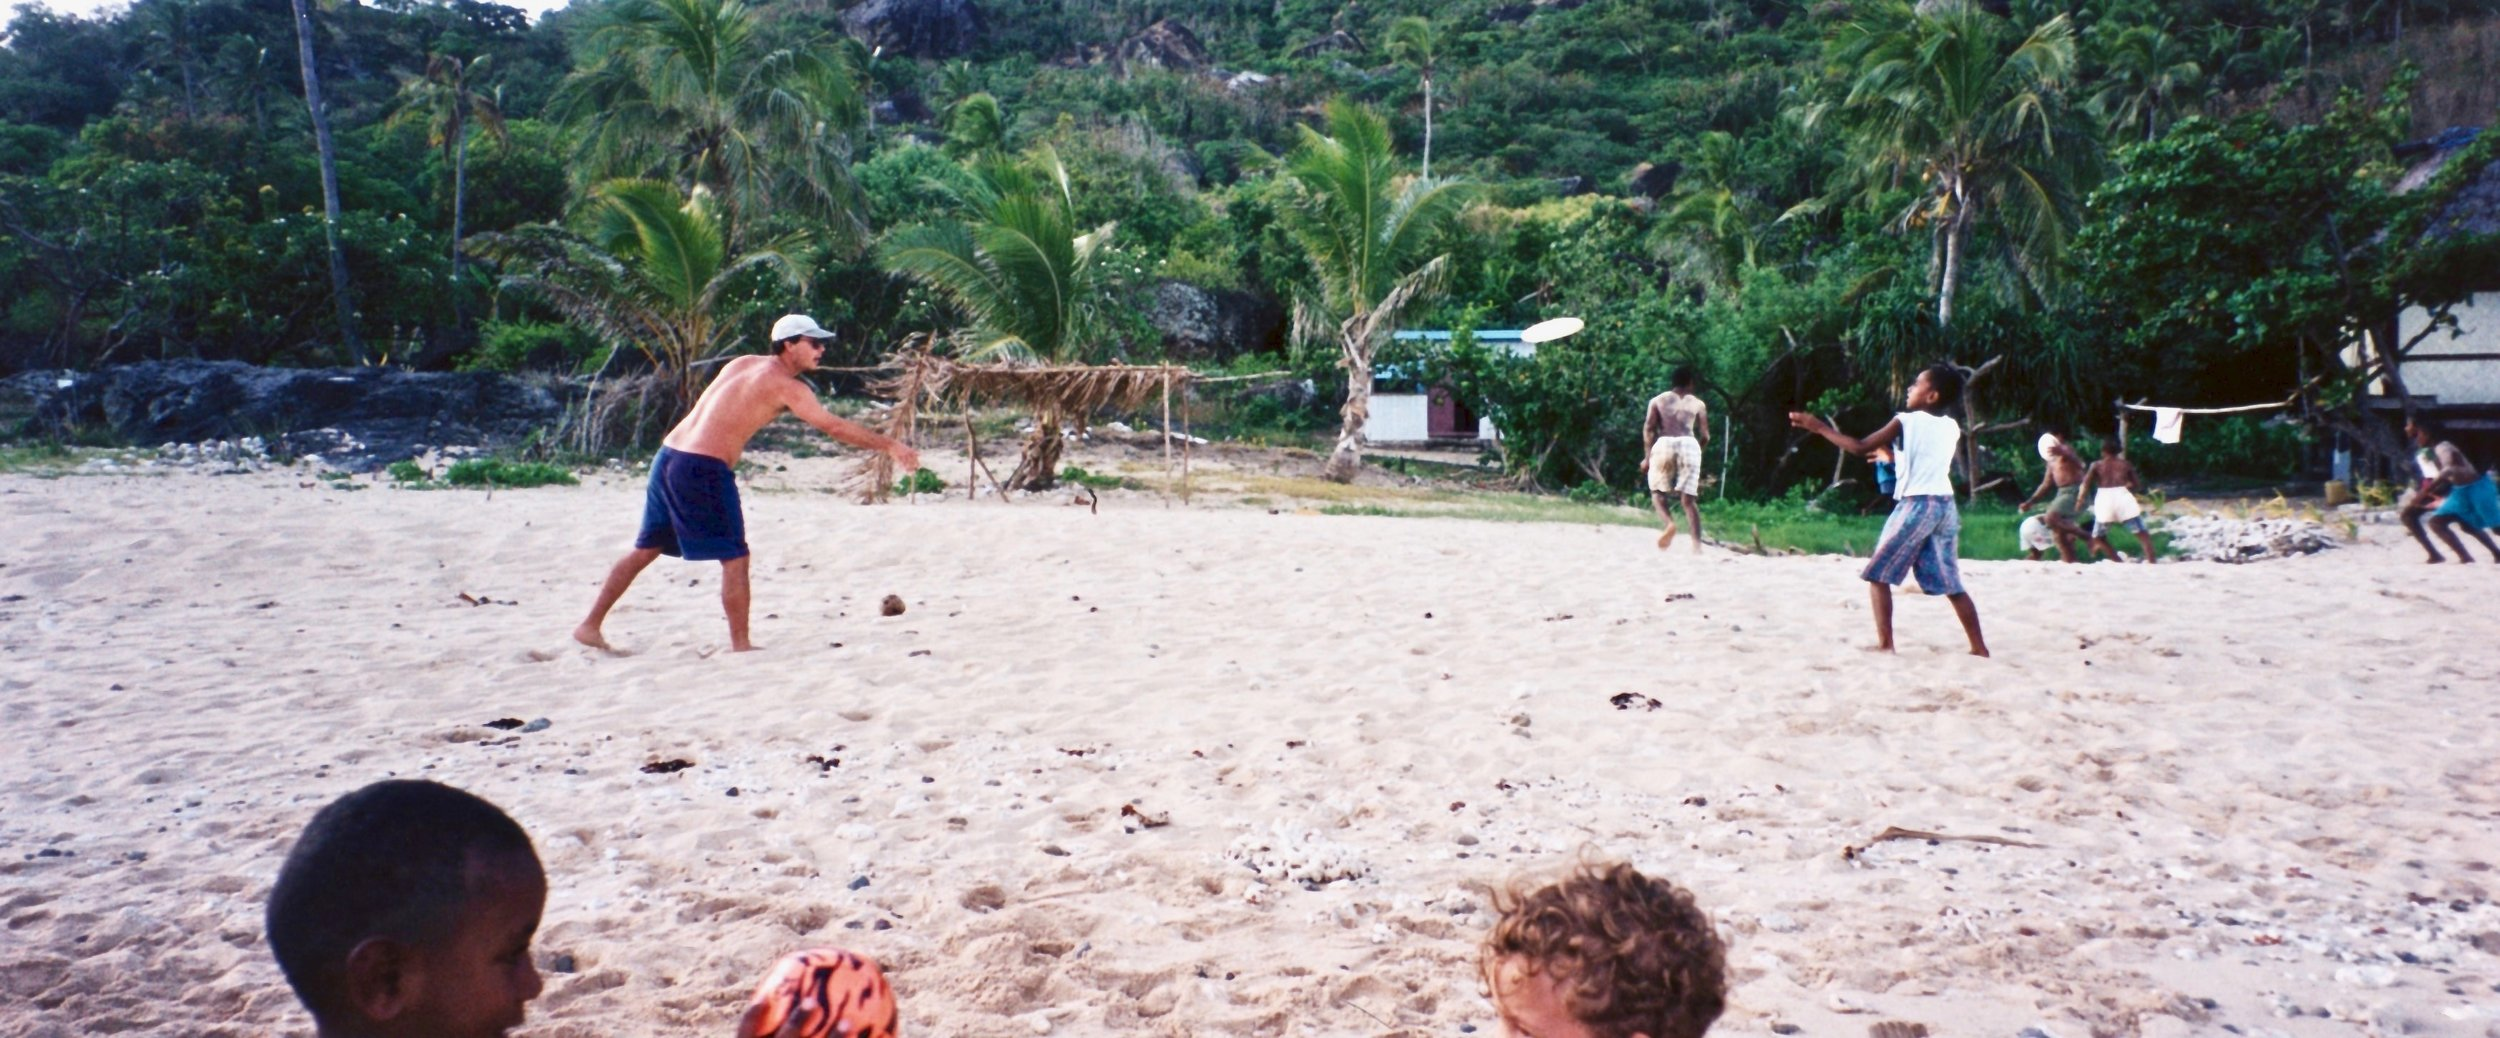 Frisbee, Fiji